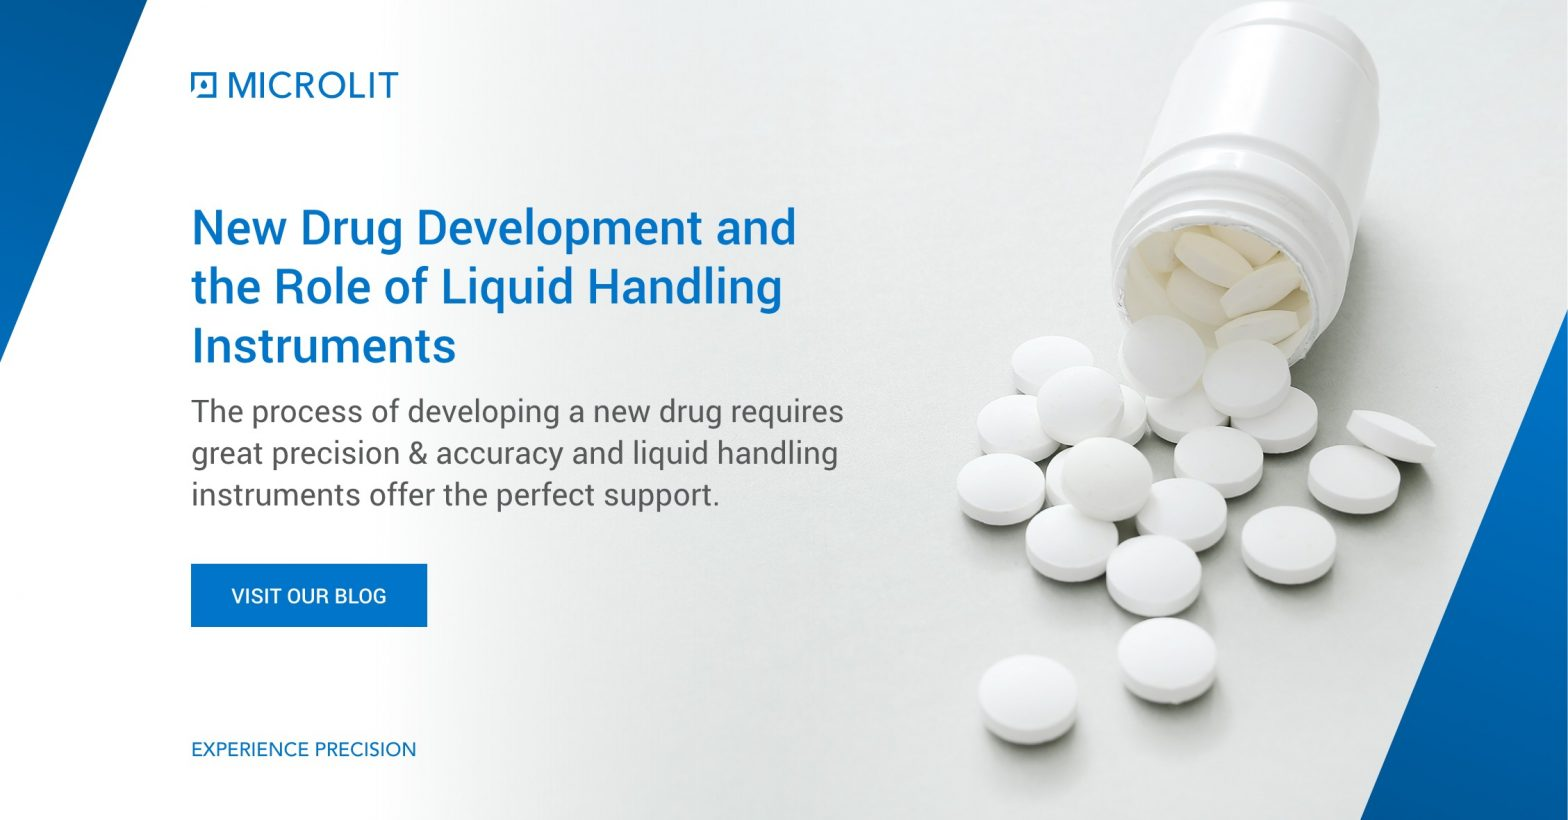 Featured image drig development